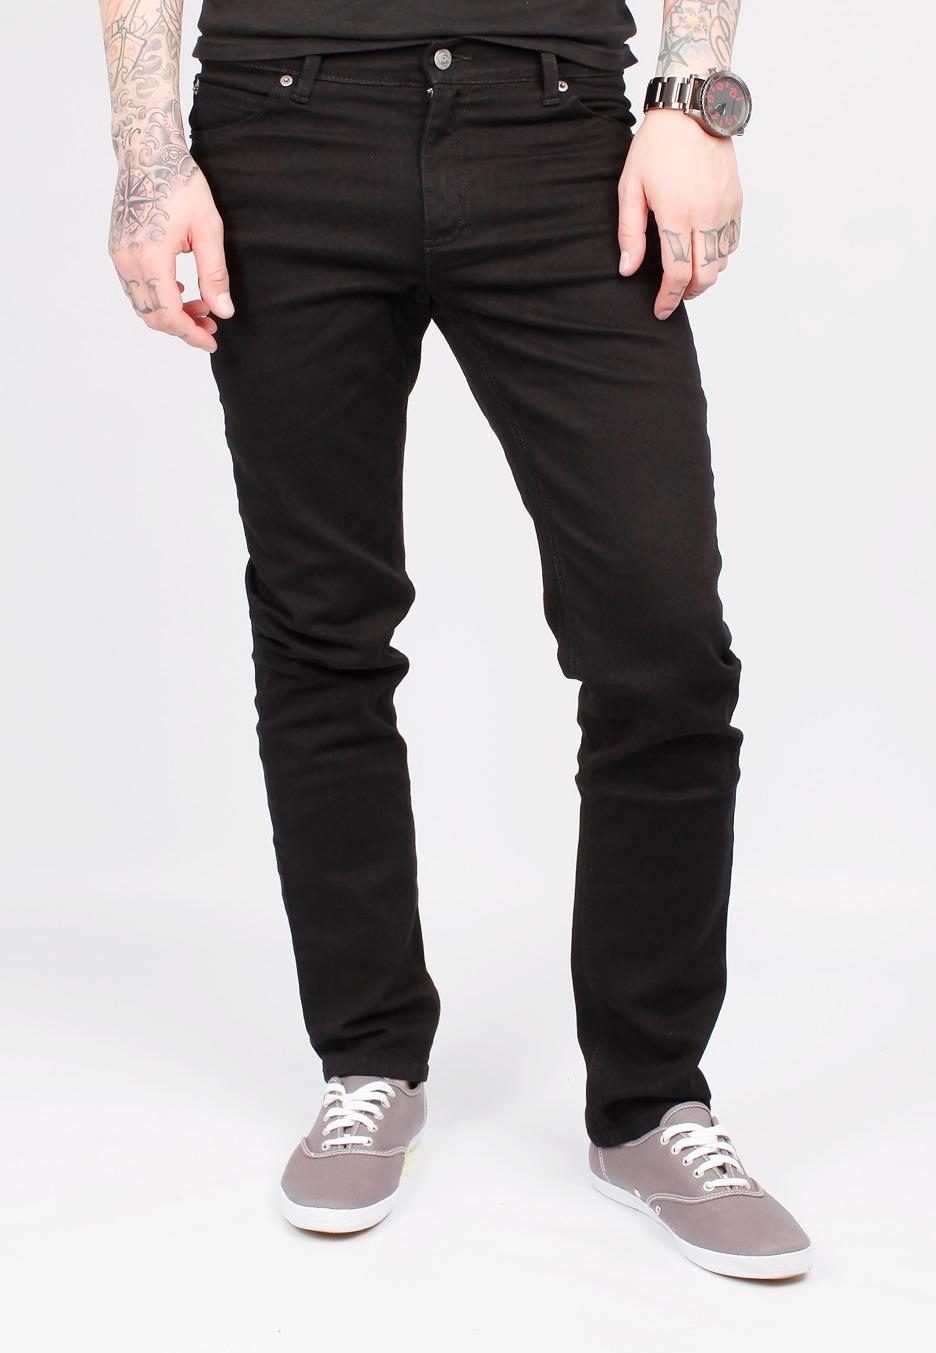 Cheap Monday - Tight OD Black - Jeans - Impericon.com Worldwide